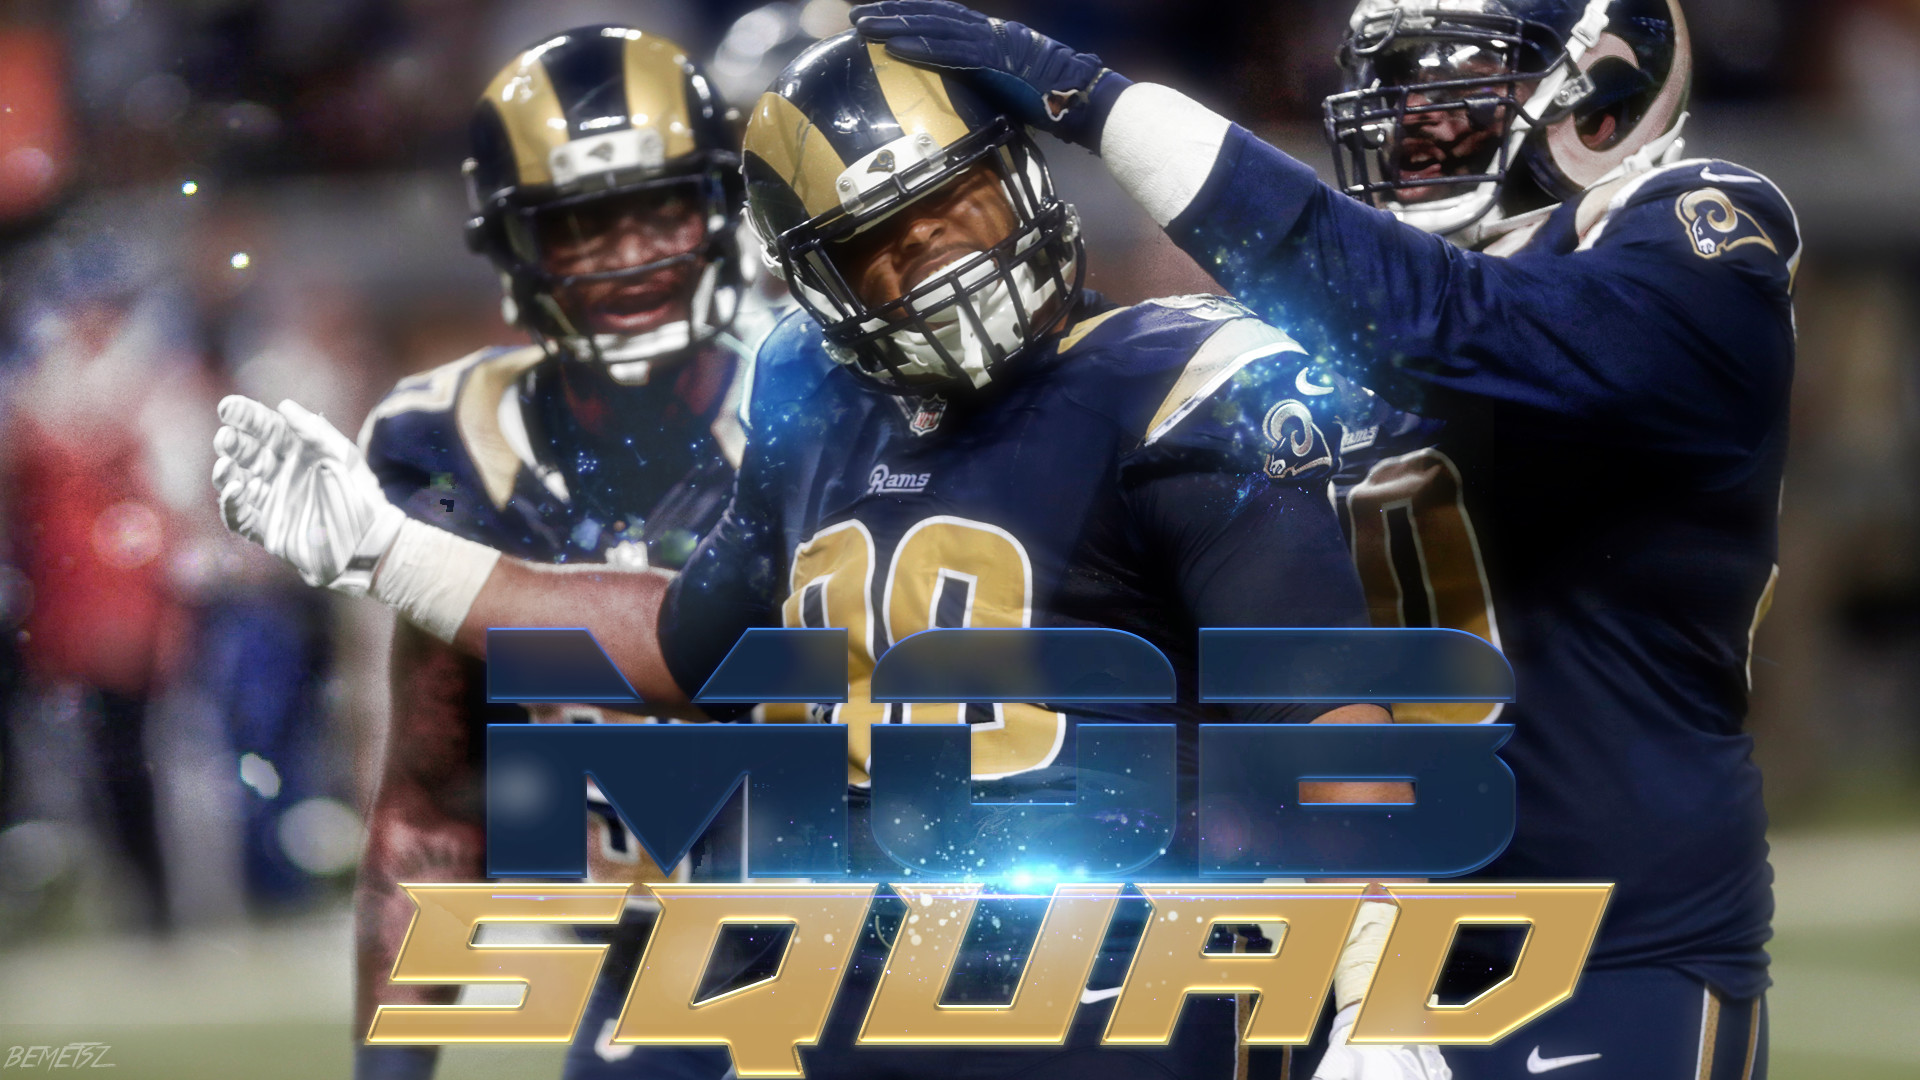 HD St Louis Rams Backgrounds.